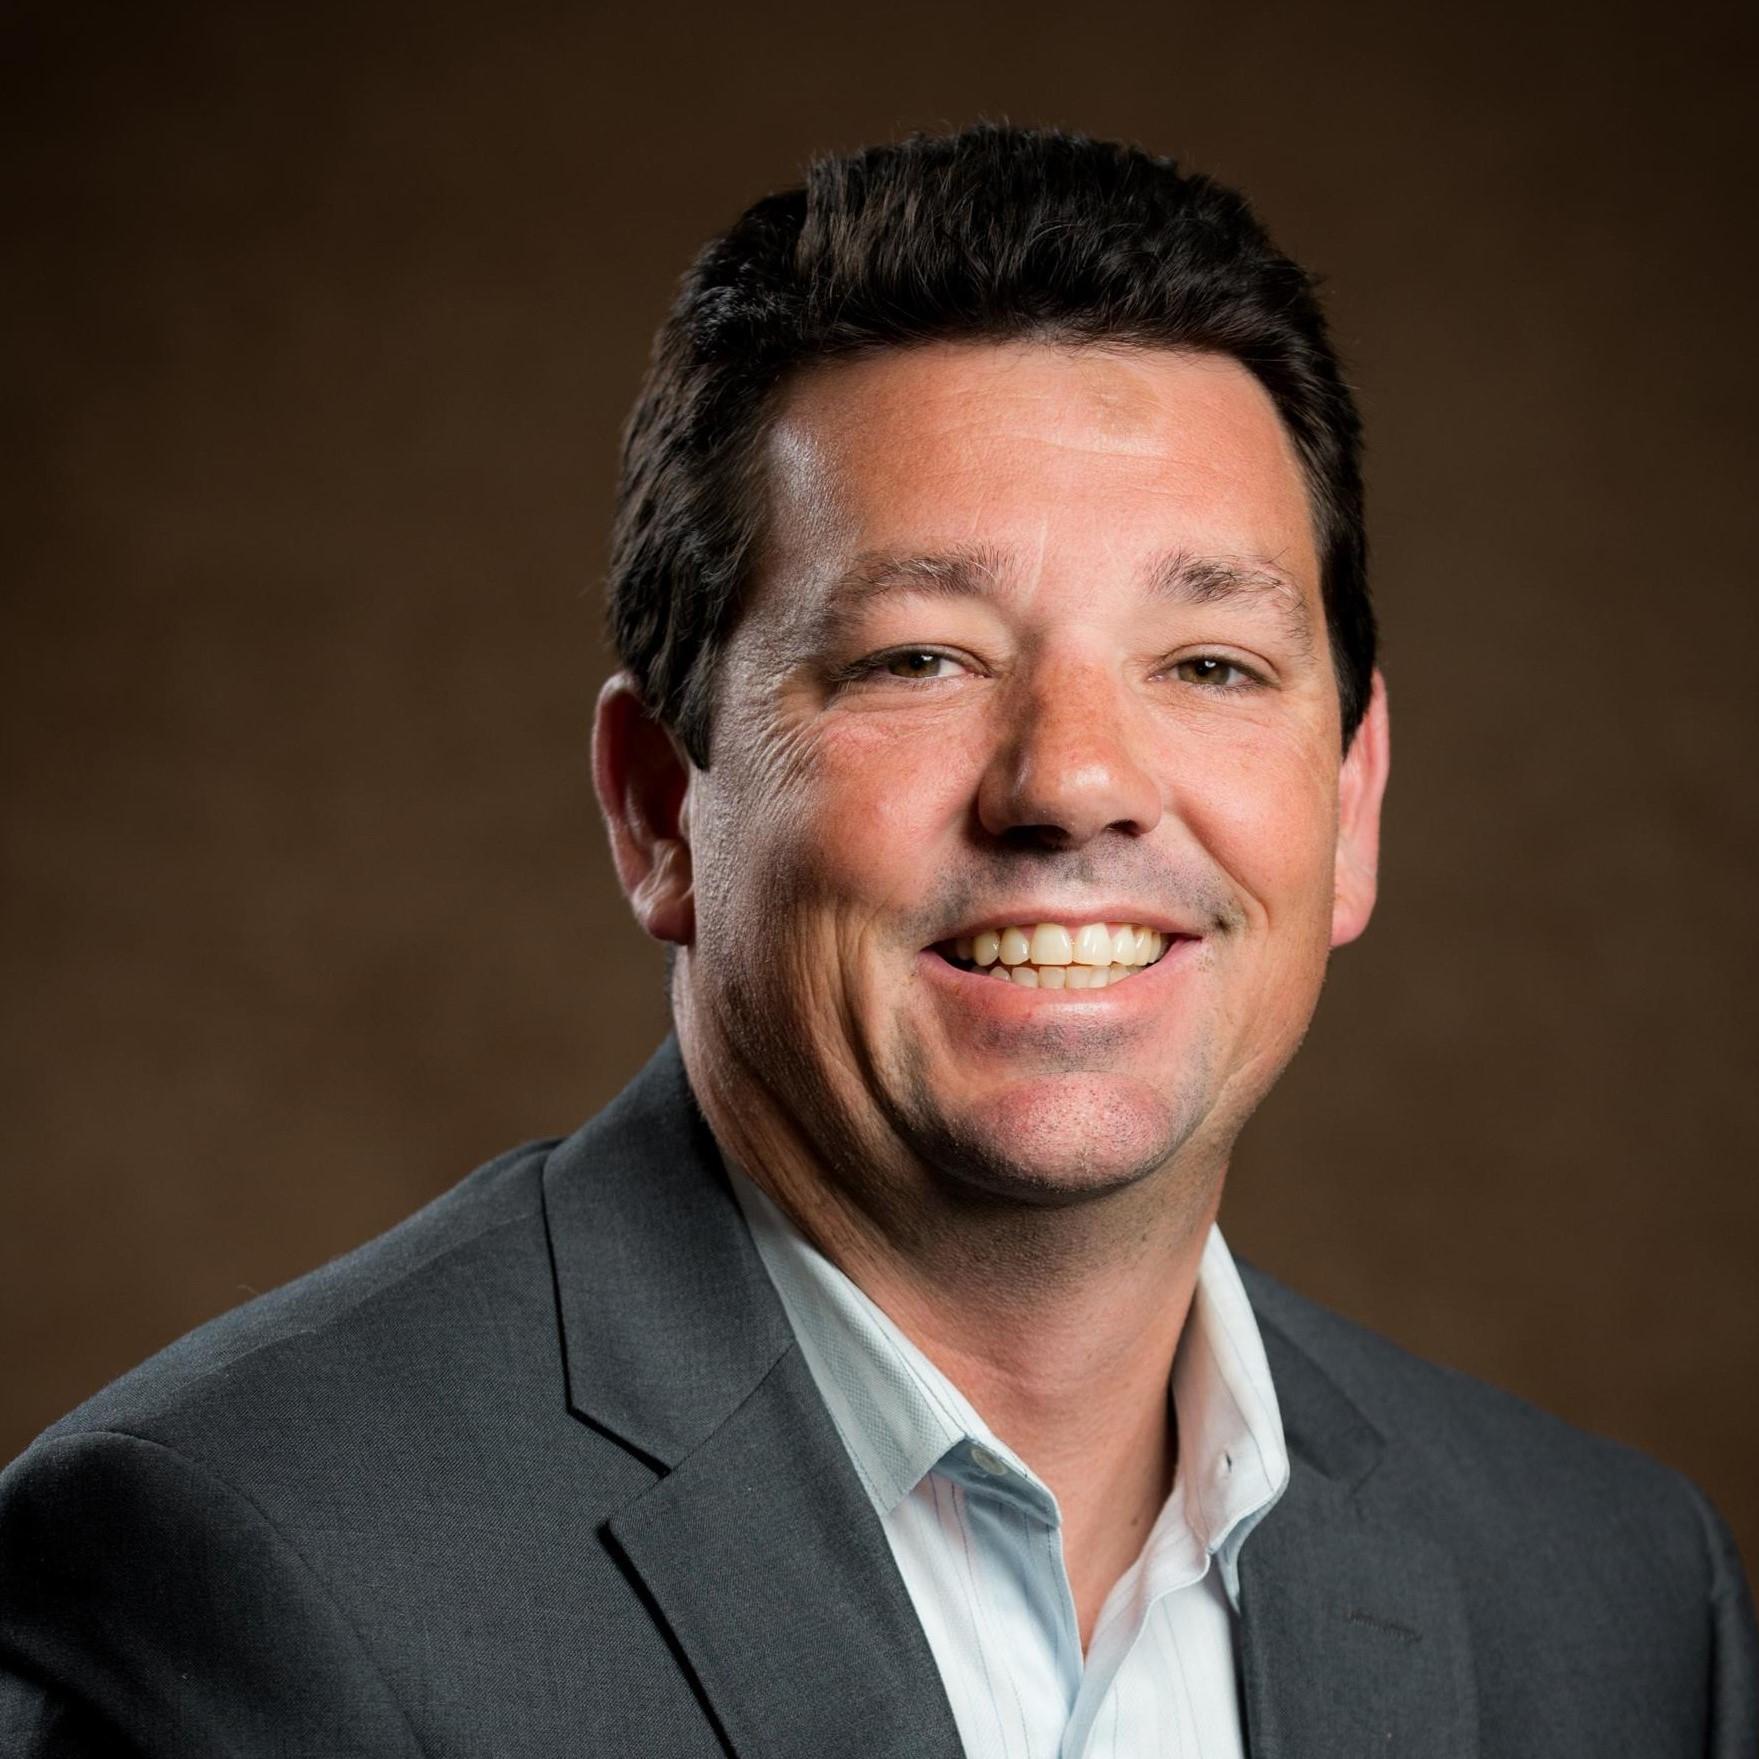 Lance Ralls Profile Picture - Headshot